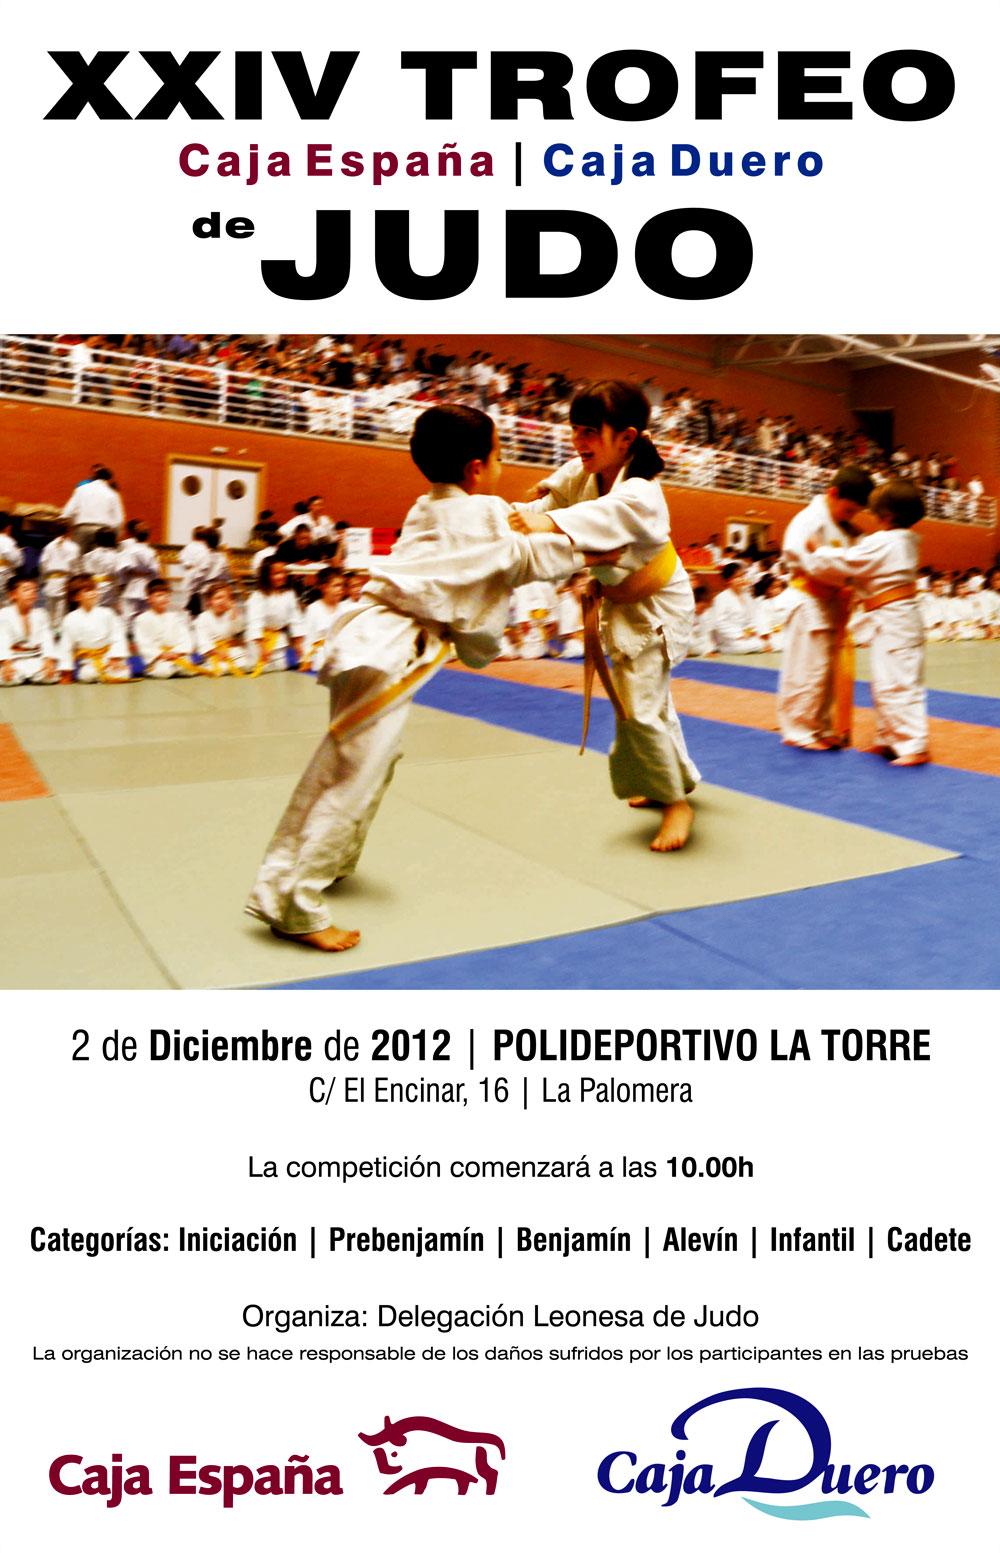 Club kyoto xxiv trofeo de judo caja espa a caja duero for Caja duero madrid oficinas